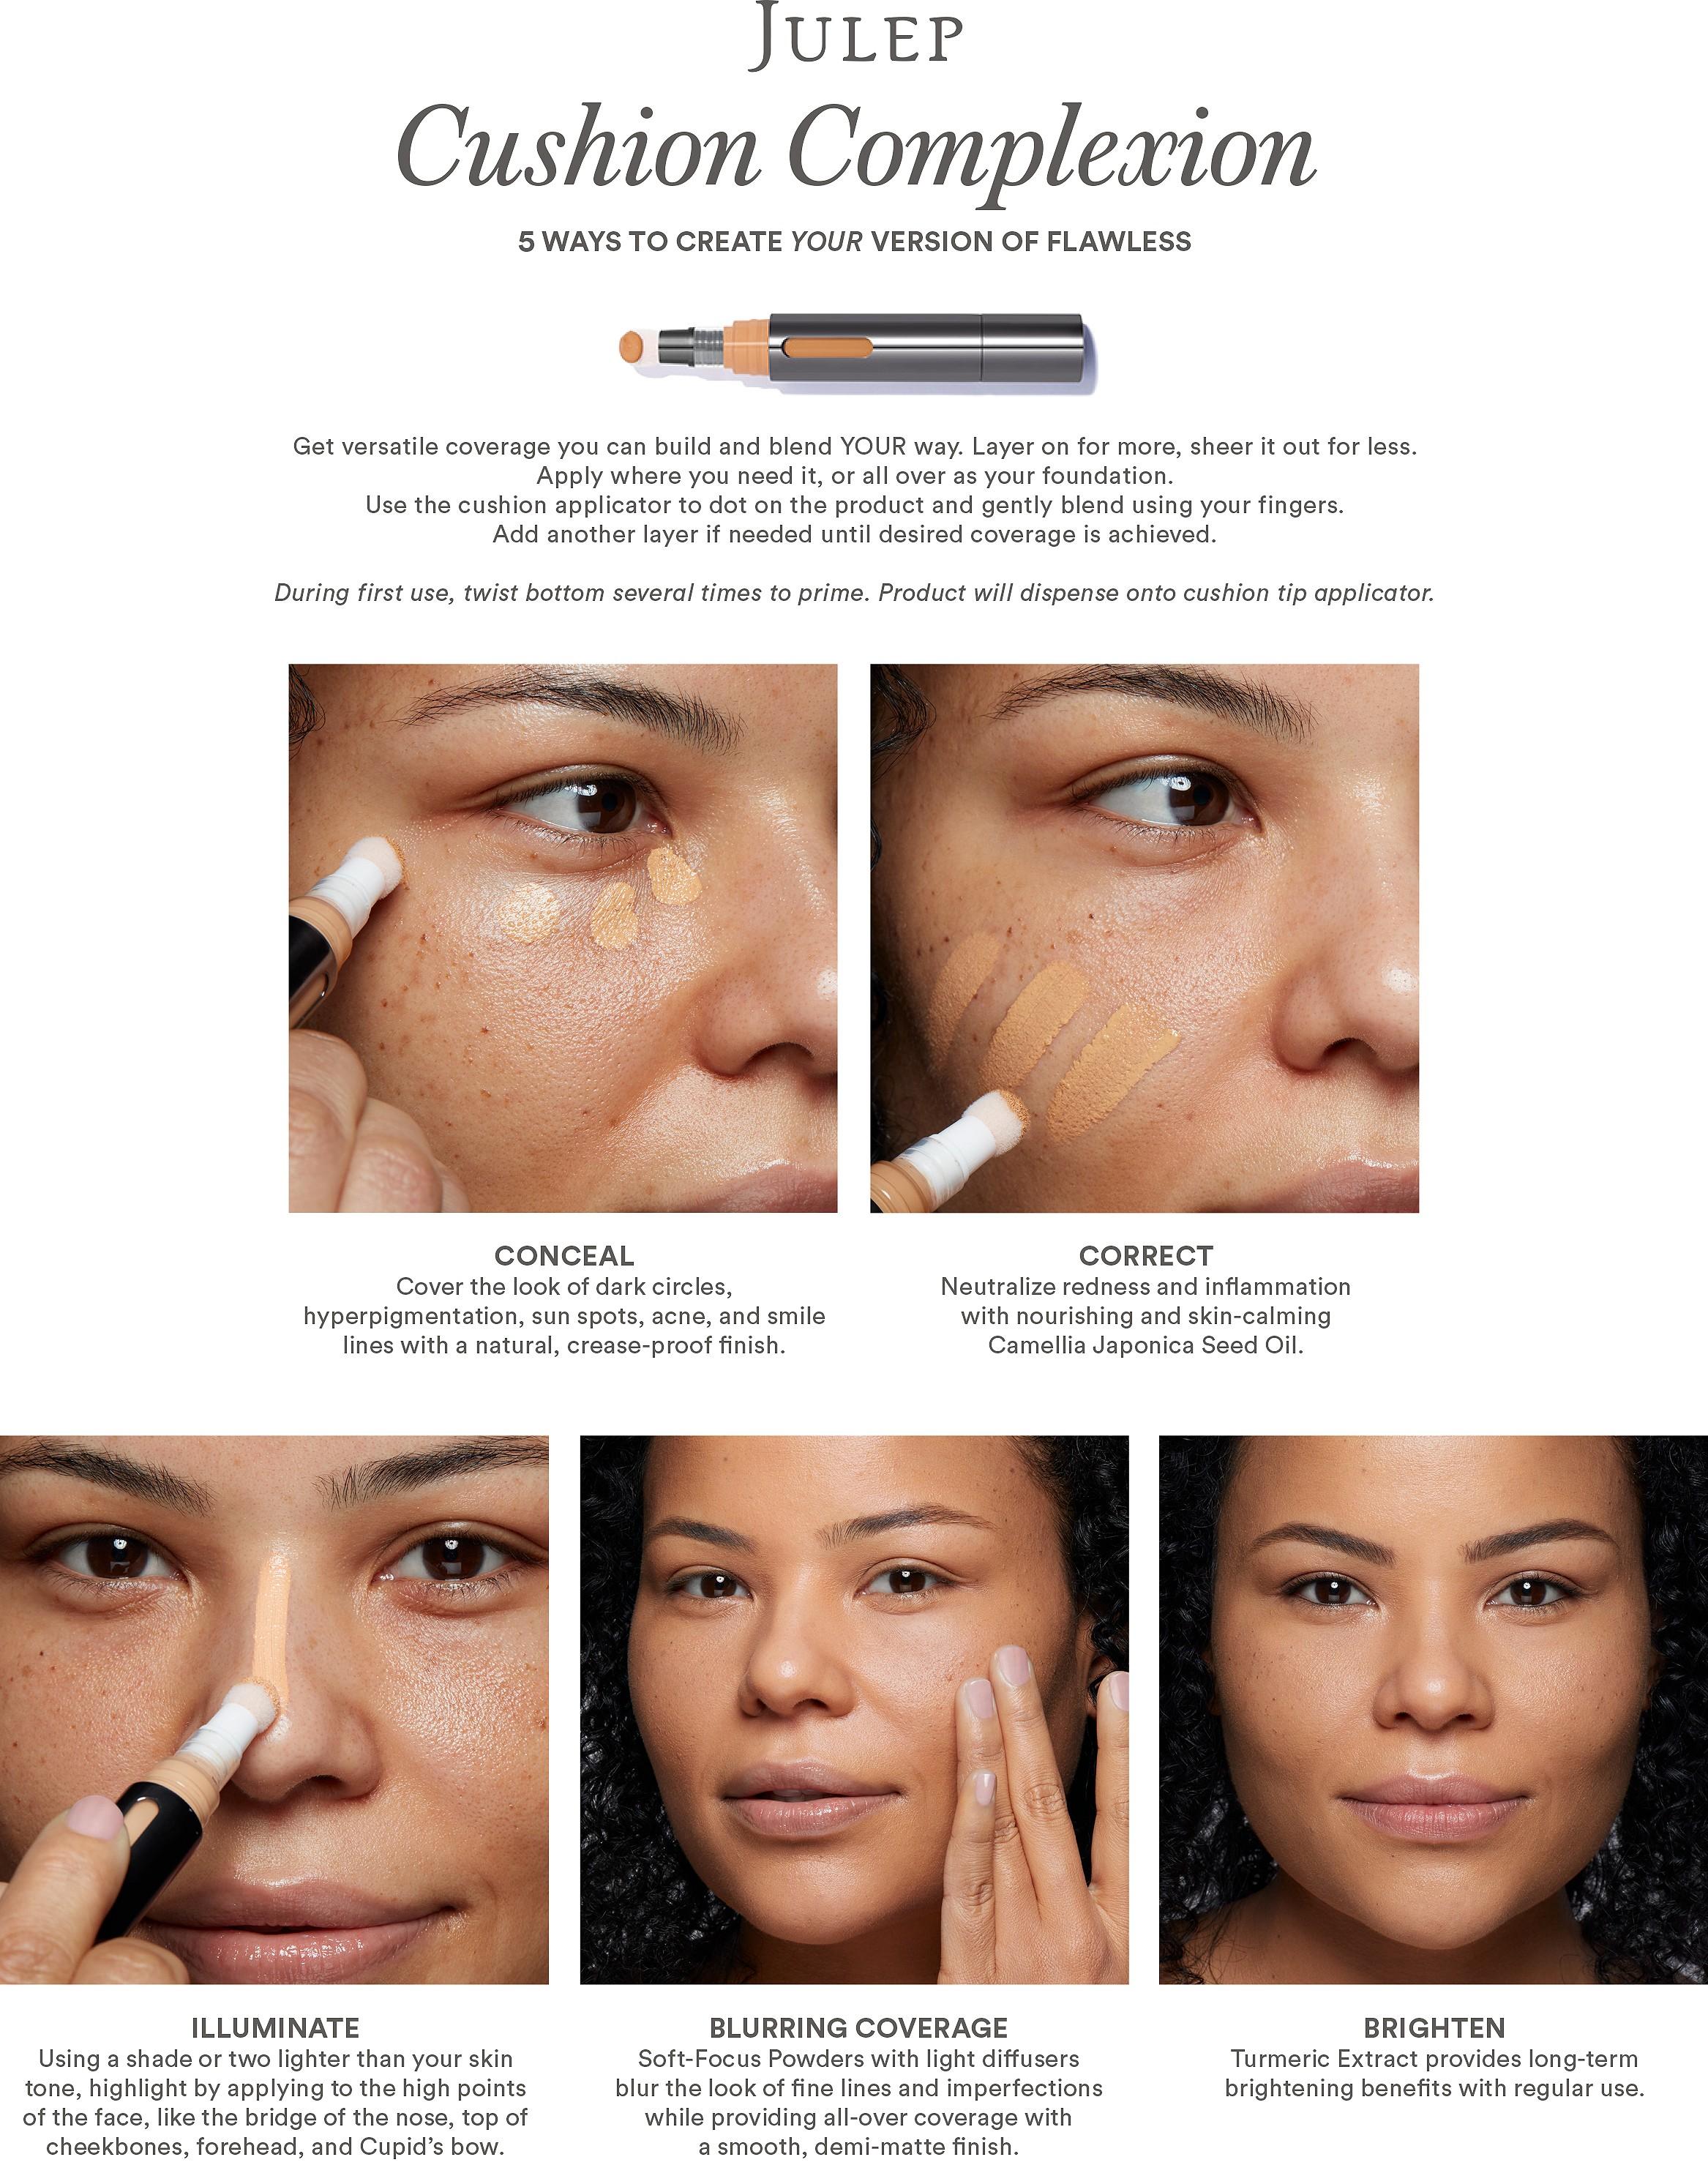 Julep Cushion Complexion 5 In 1 Skin Perfector With Turmeric Ulta